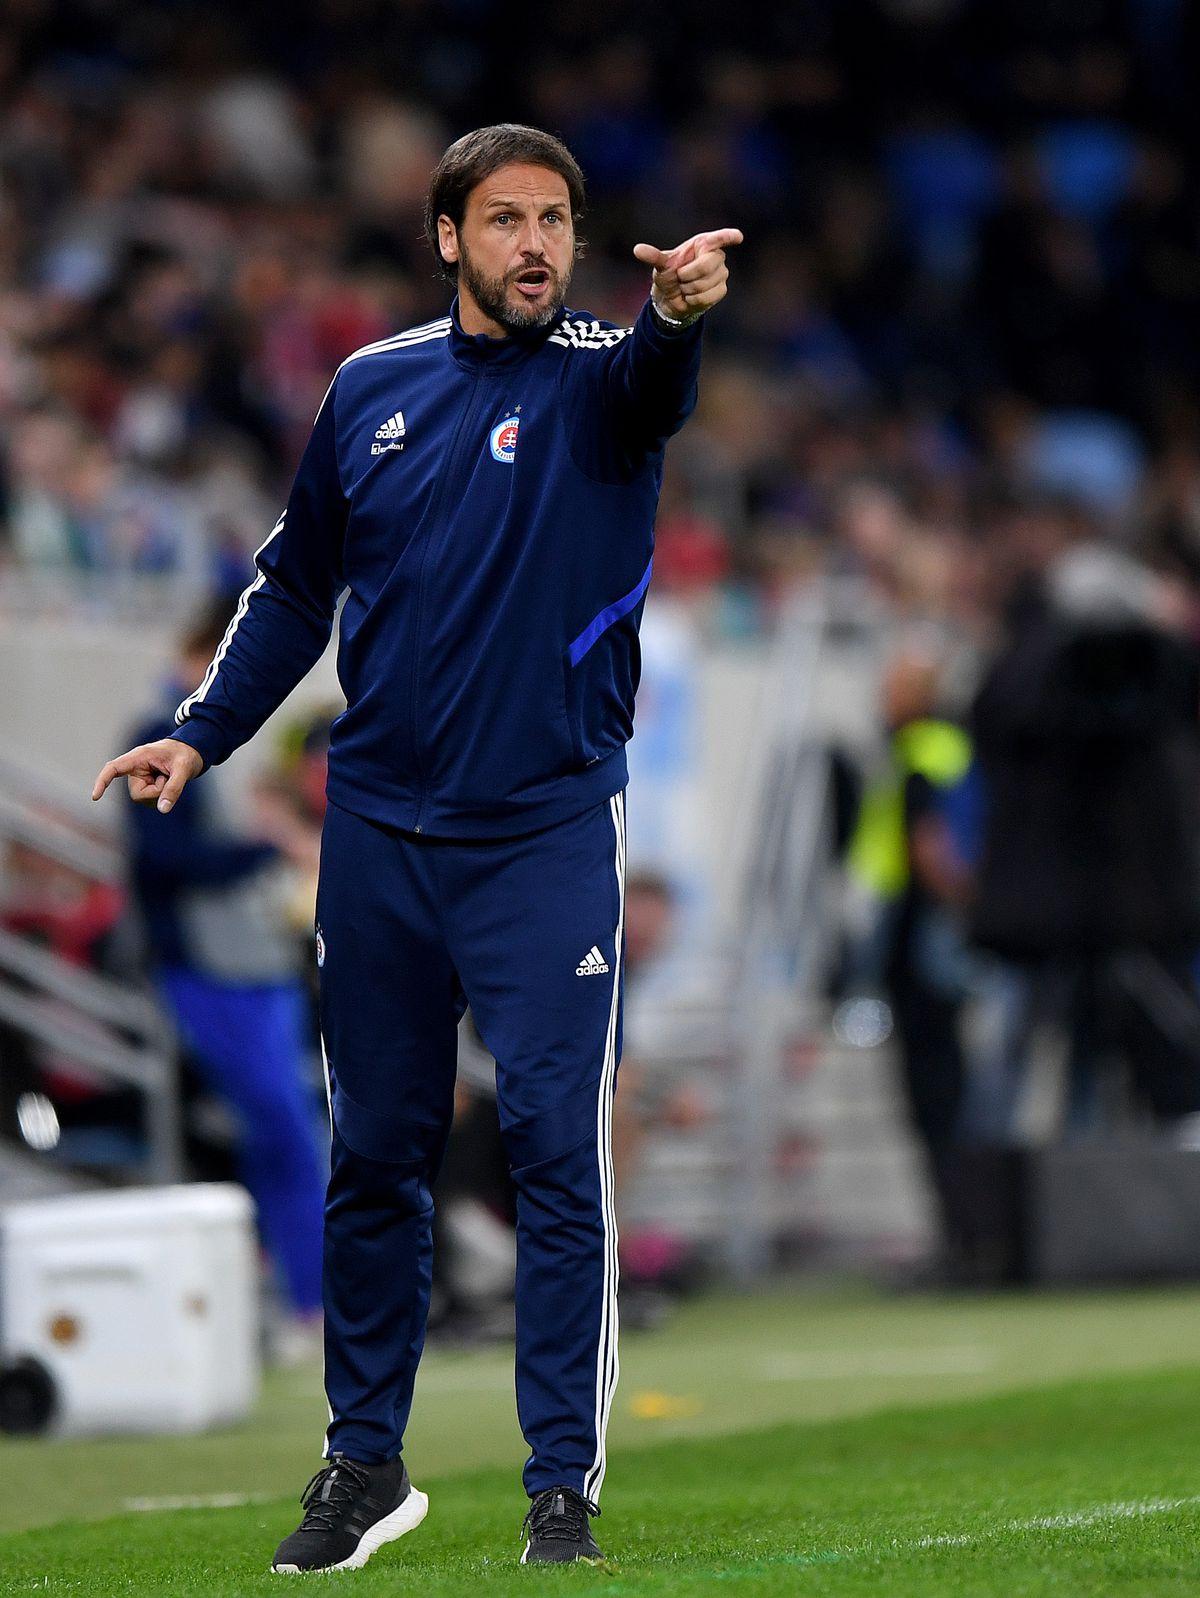 Jan Kozak the head coach / manager of Slovan Bratislava.